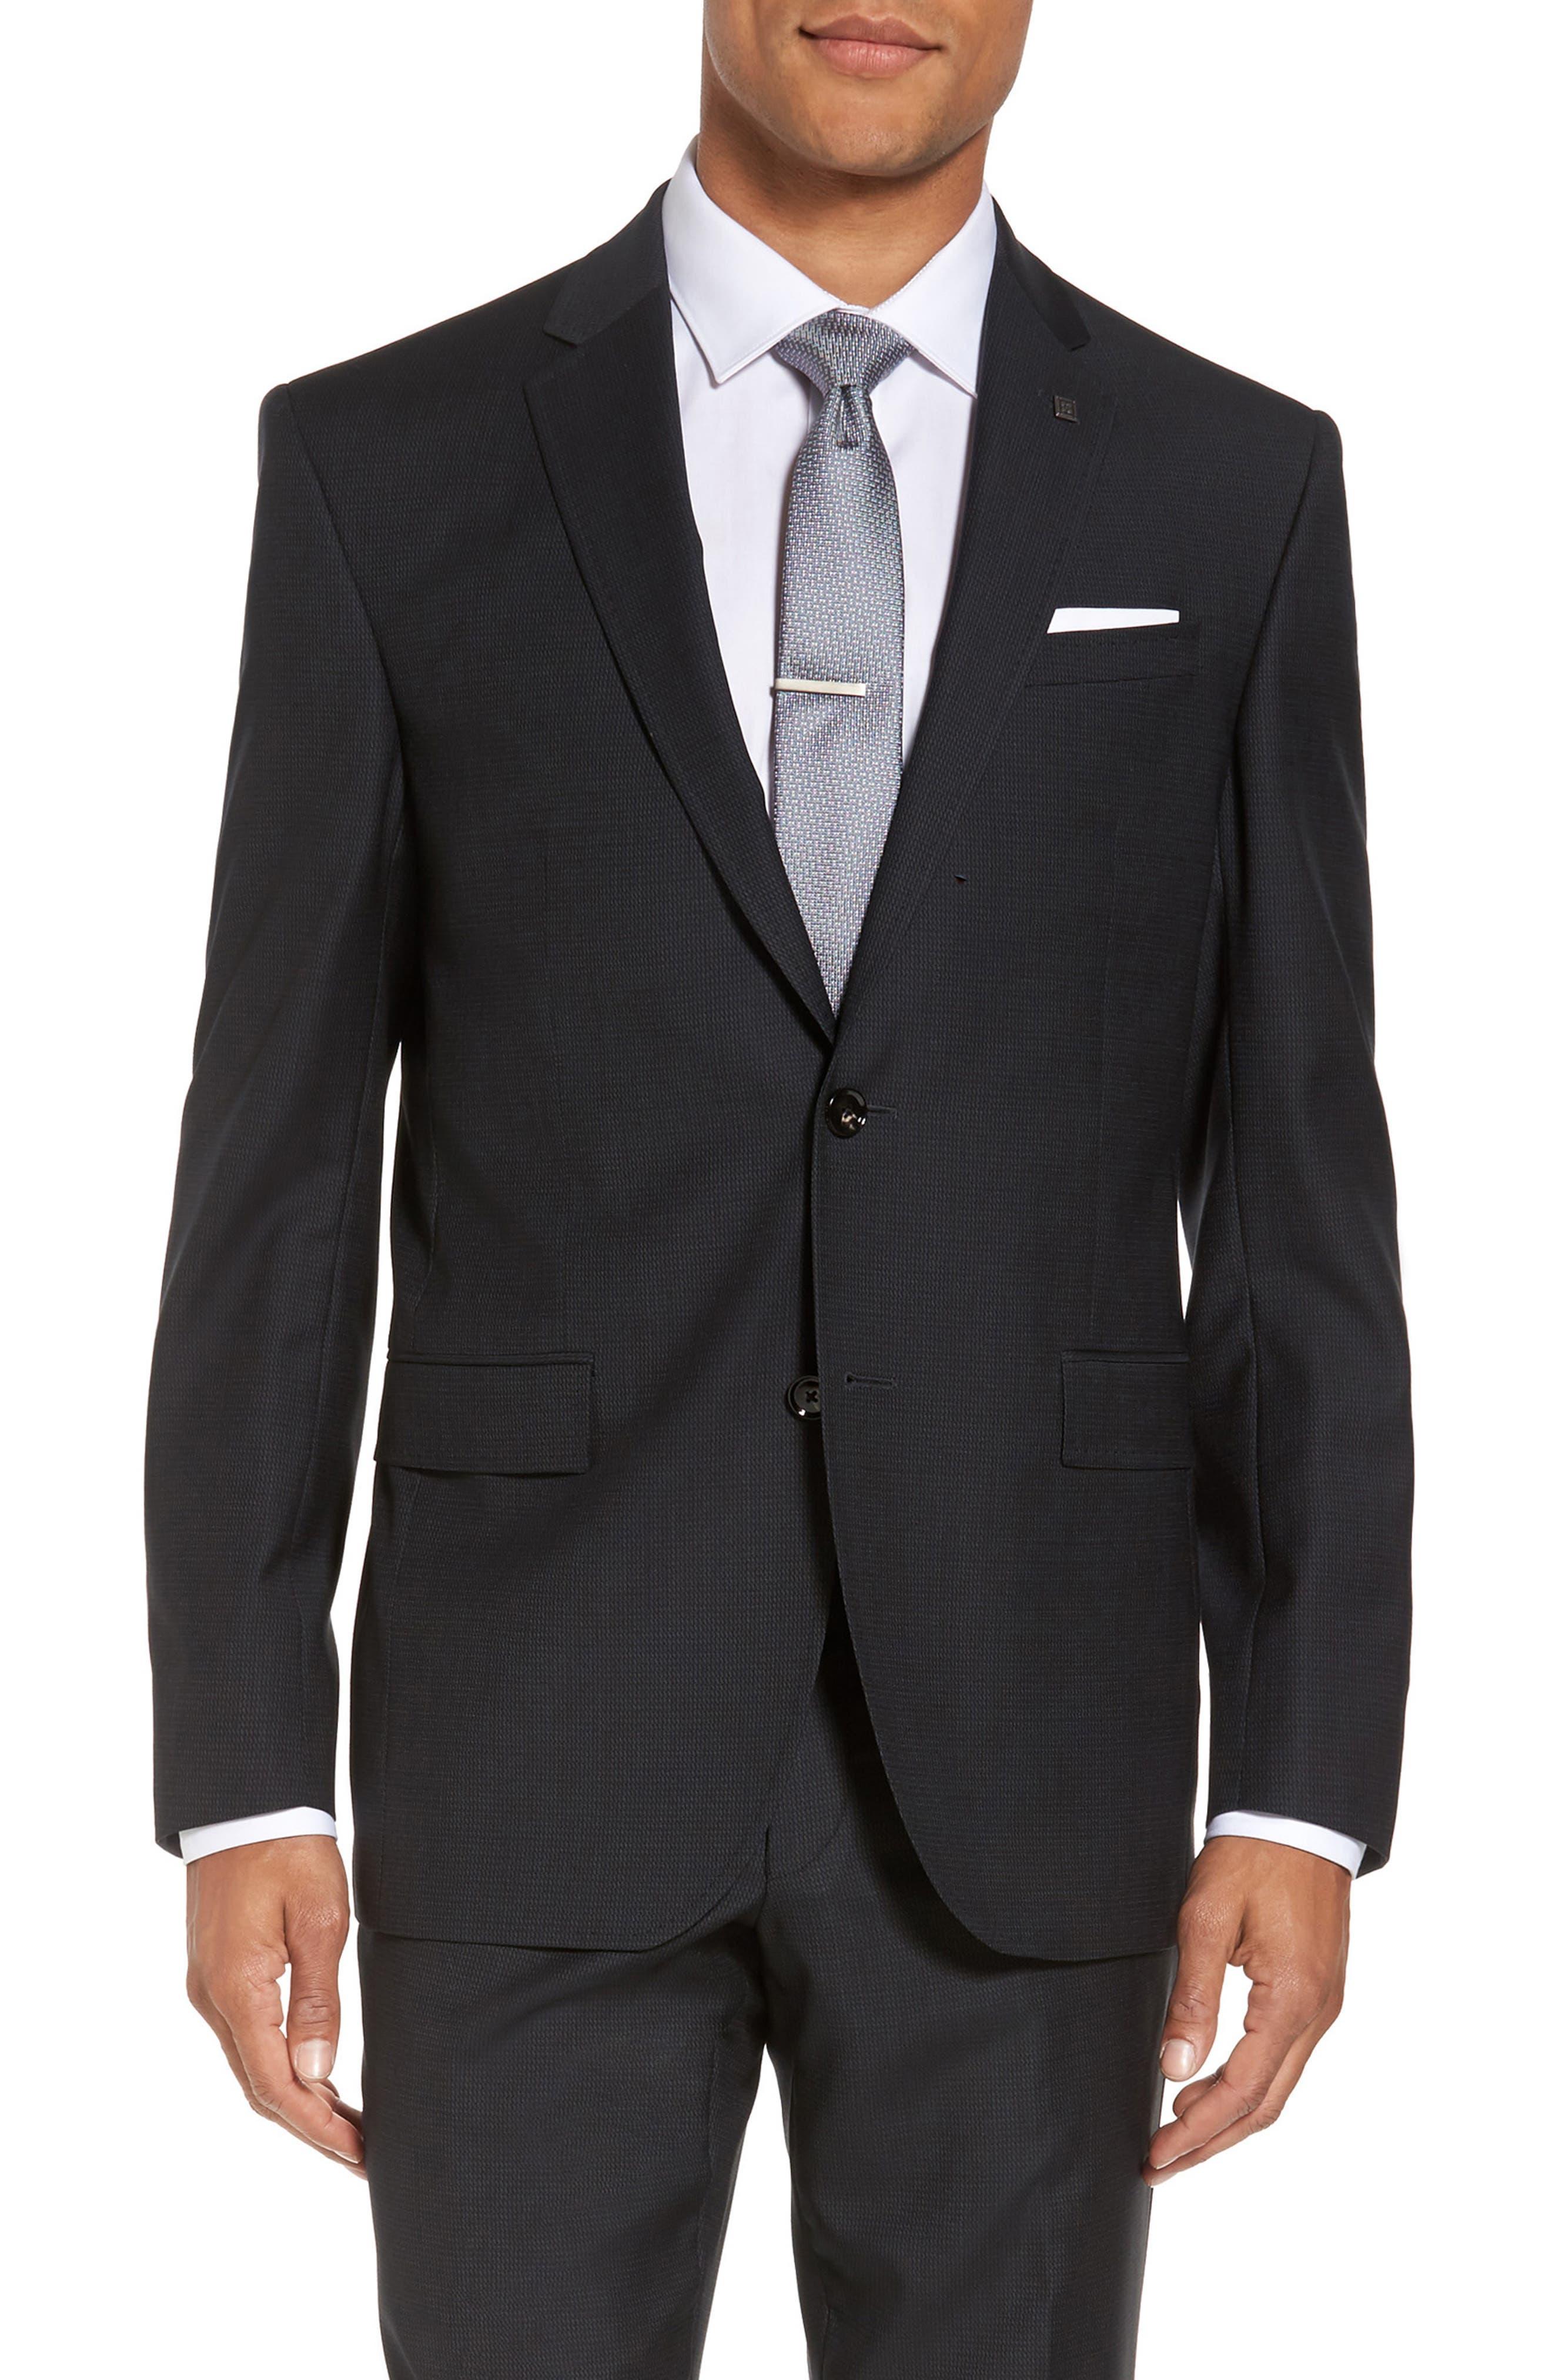 Jay Trim Fit Solid Wool Suit,                             Alternate thumbnail 5, color,                             001